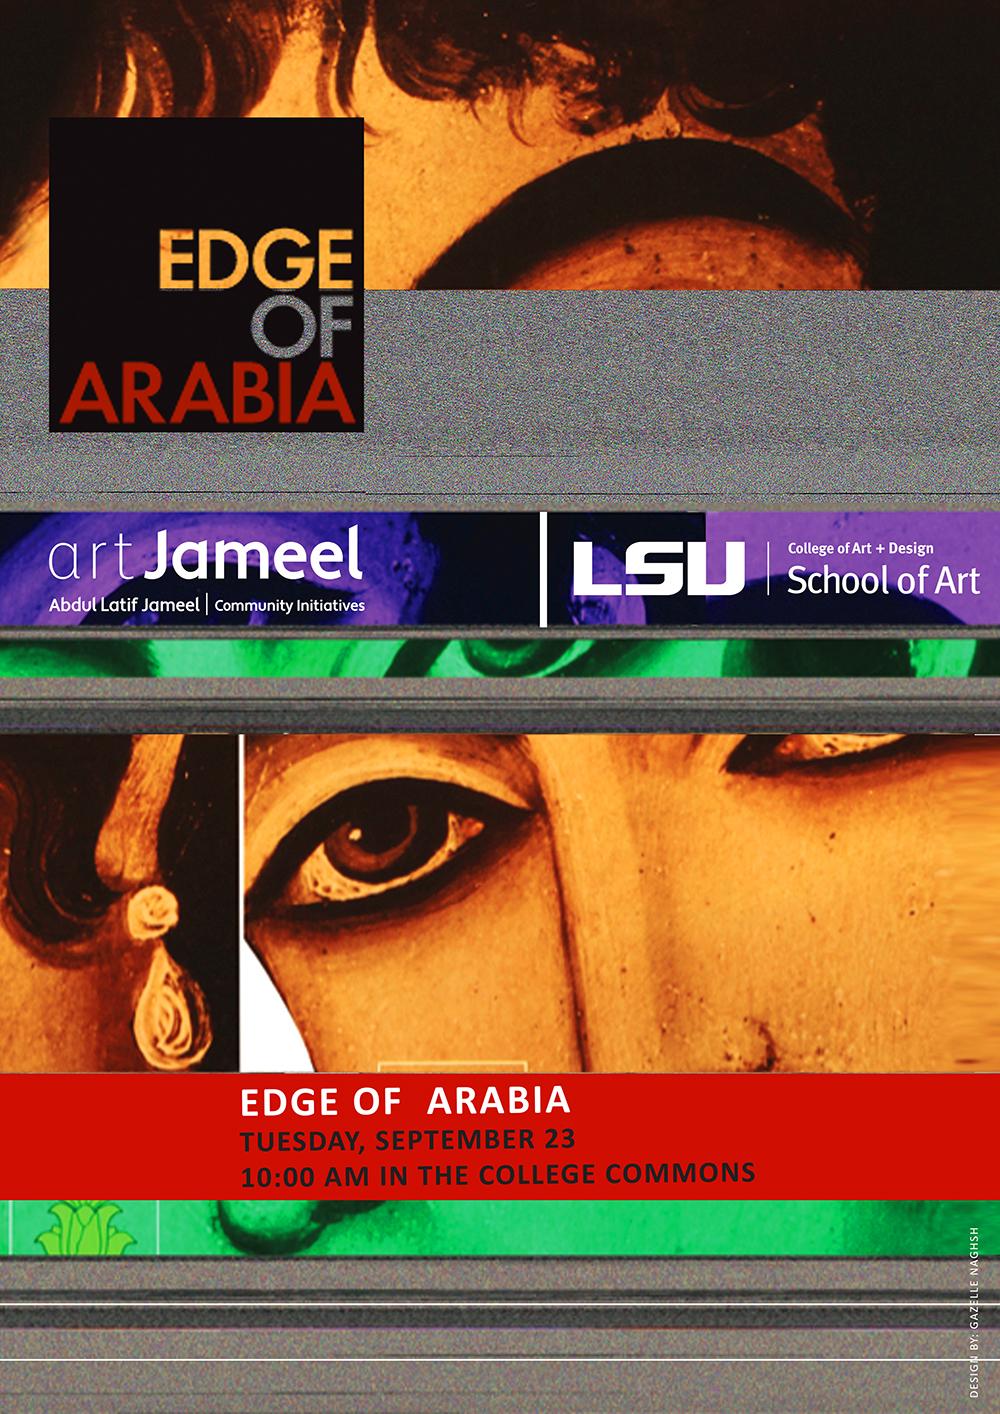 Edge of Arabia poster